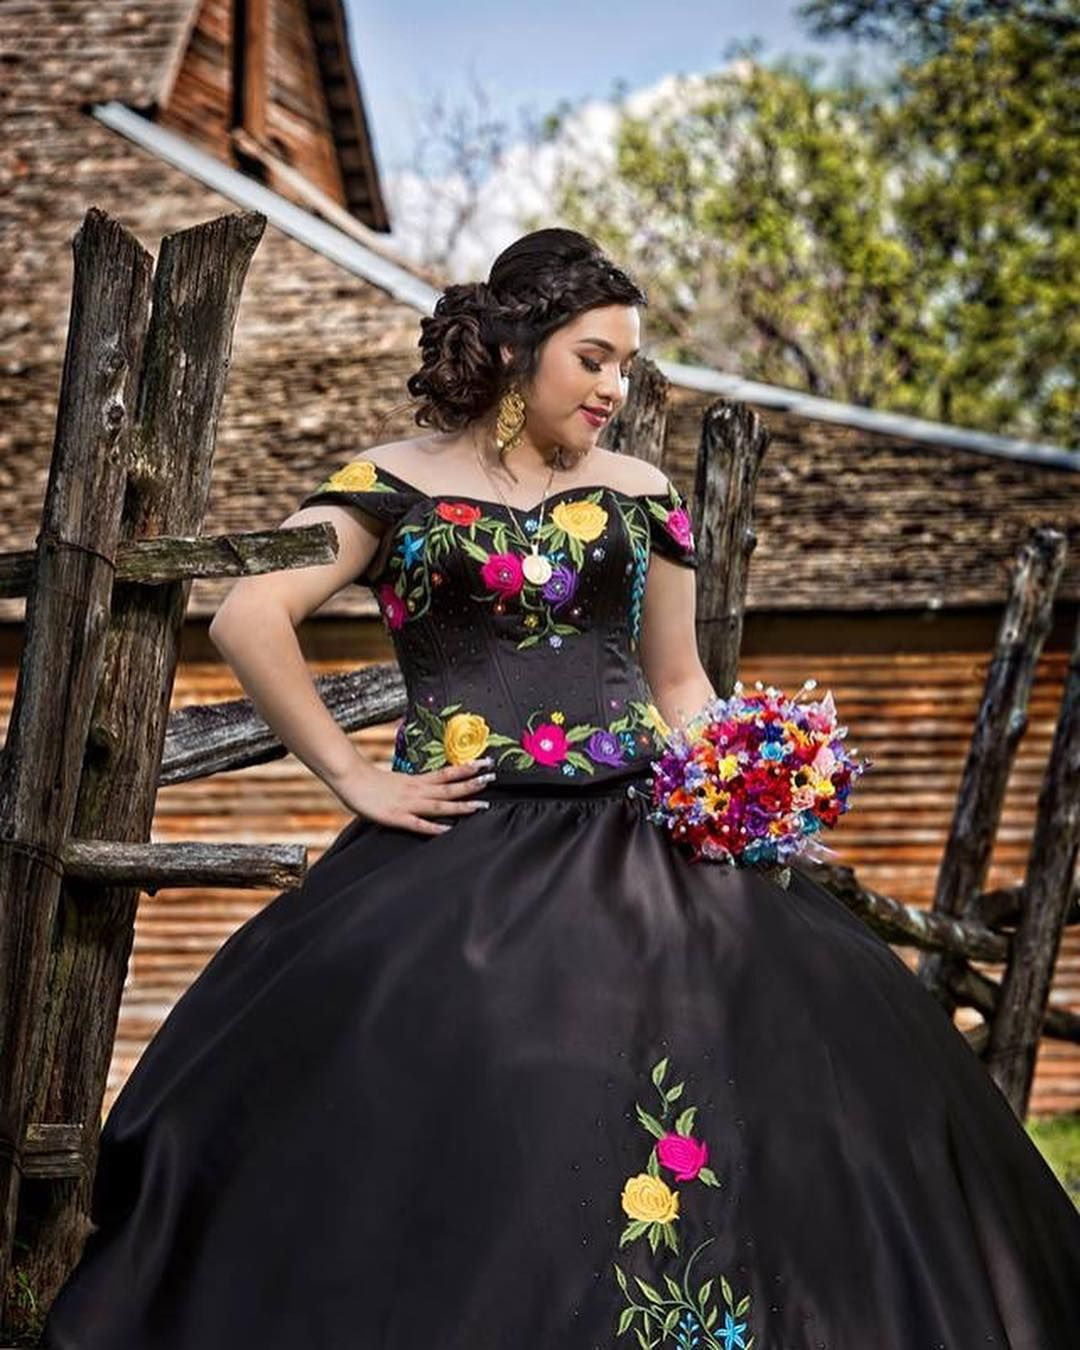 Mexican Themed Quinceanera Quinceanera Al Estilo Mexicano Quince Dresses Mexican Mexican Quinceanera Dresses Black Quinceanera Dresses [ 1350 x 1080 Pixel ]